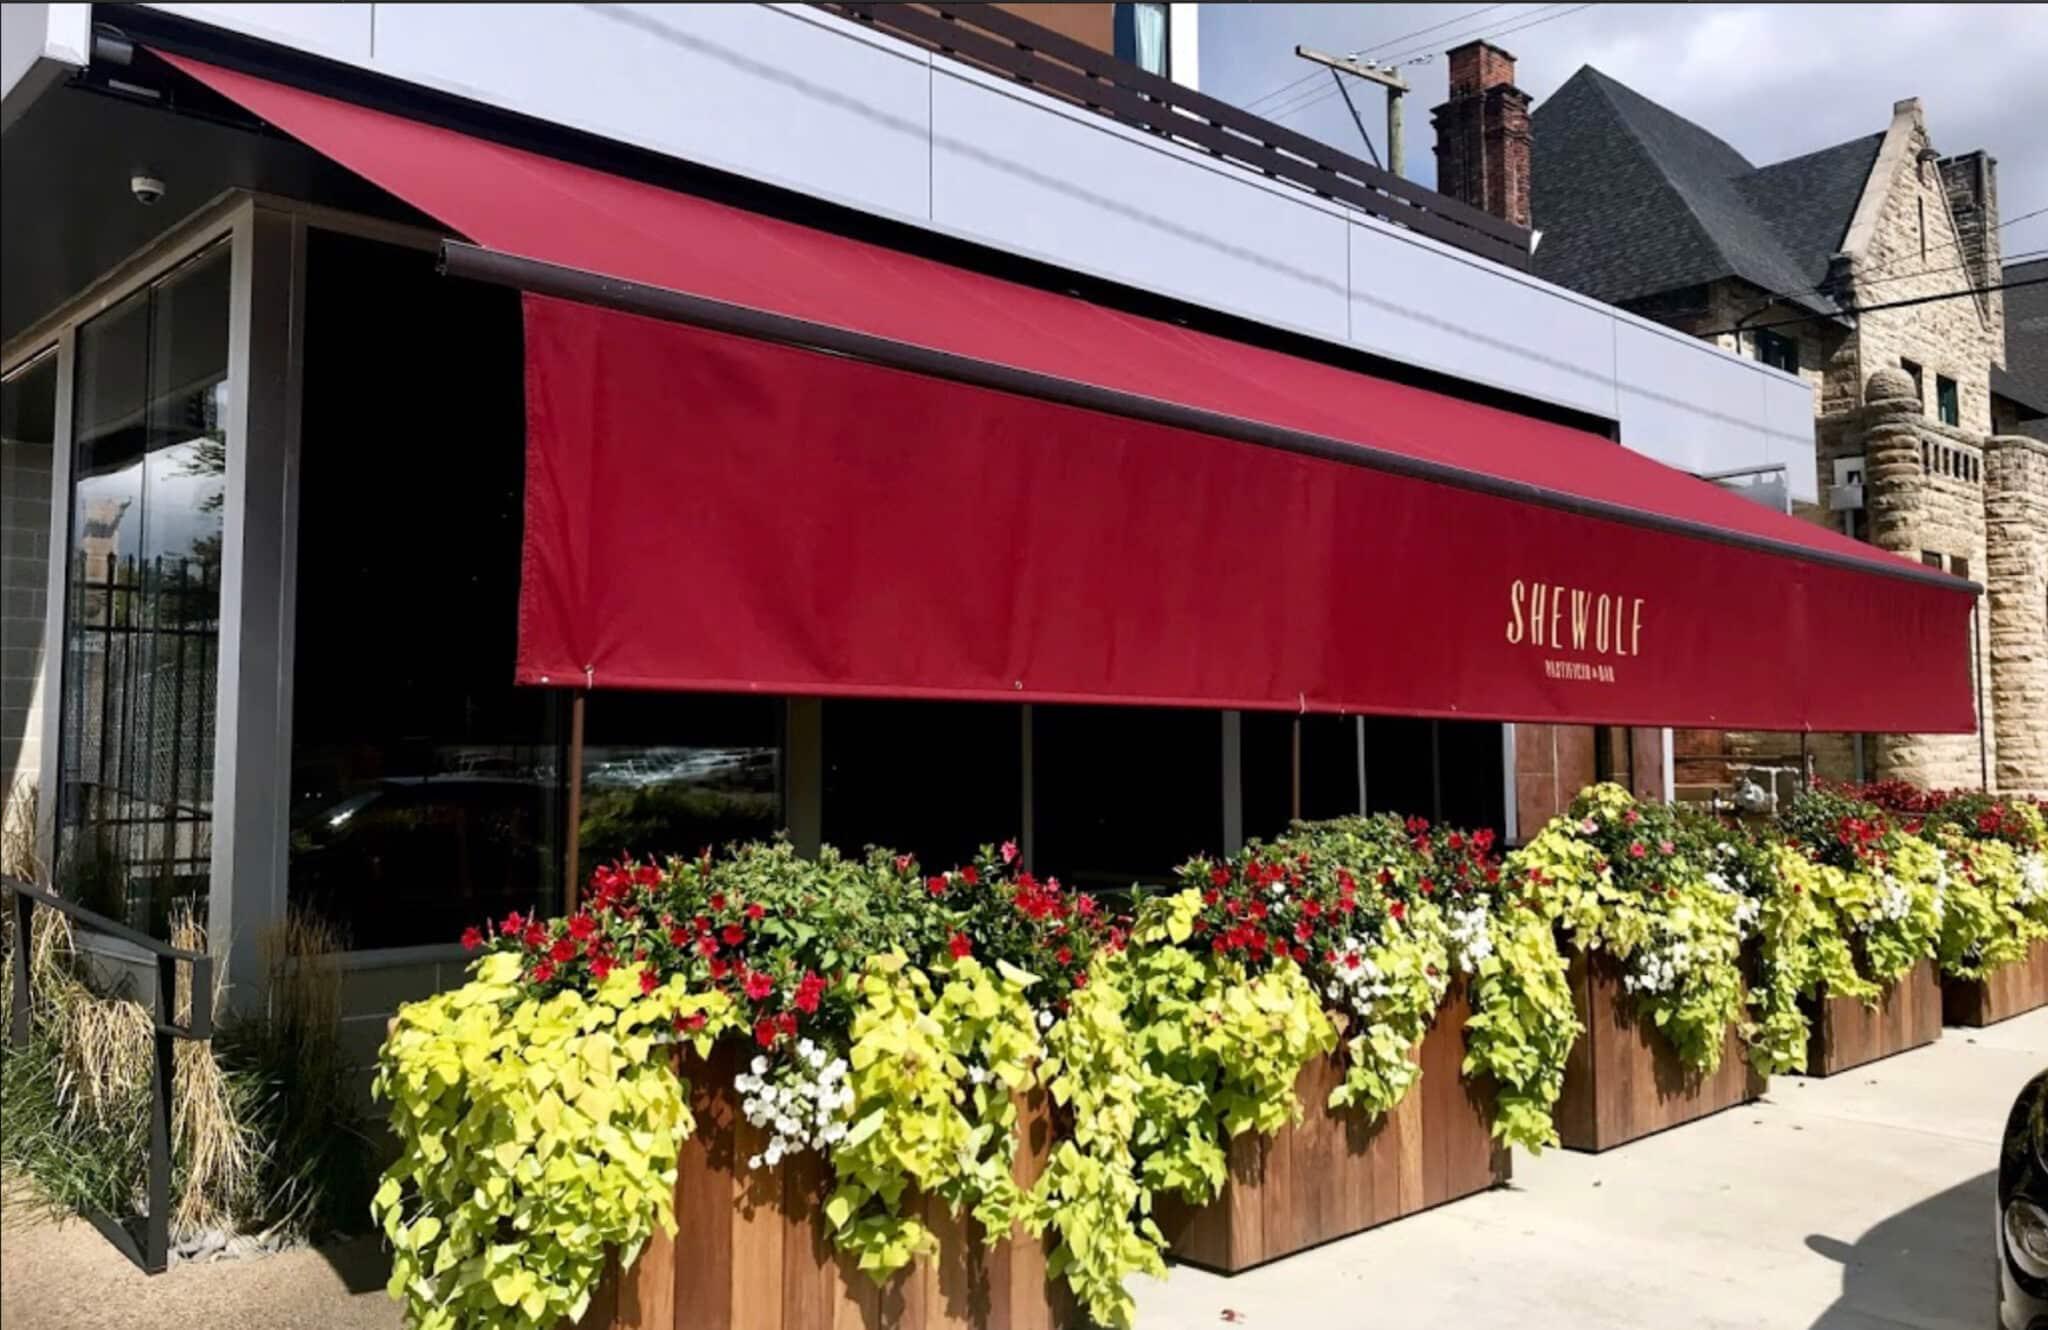 Restaurant Storefront Awning